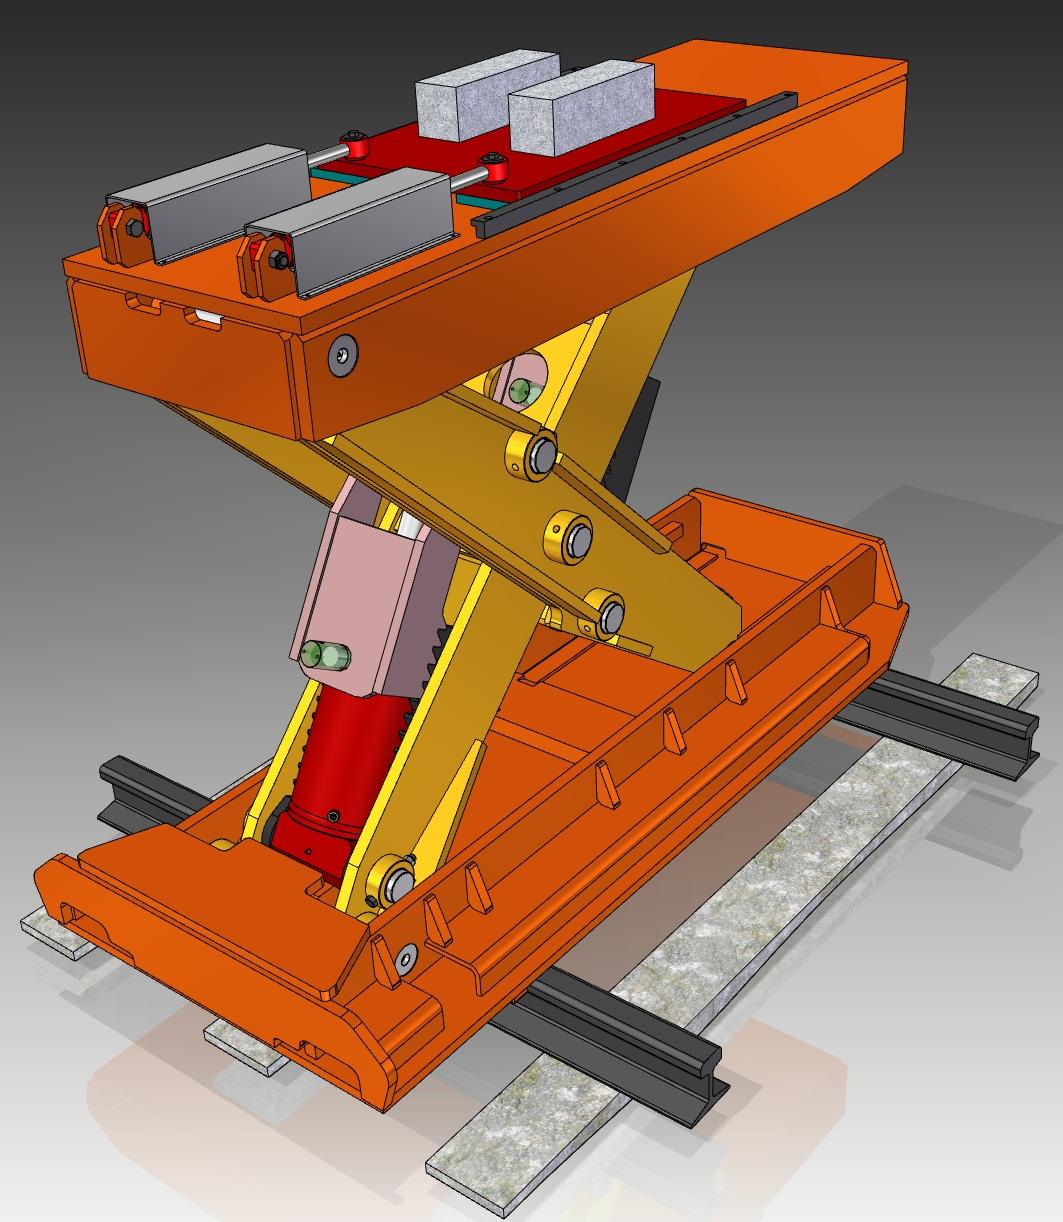 35 Ton Rail Car Jack with Side Shift